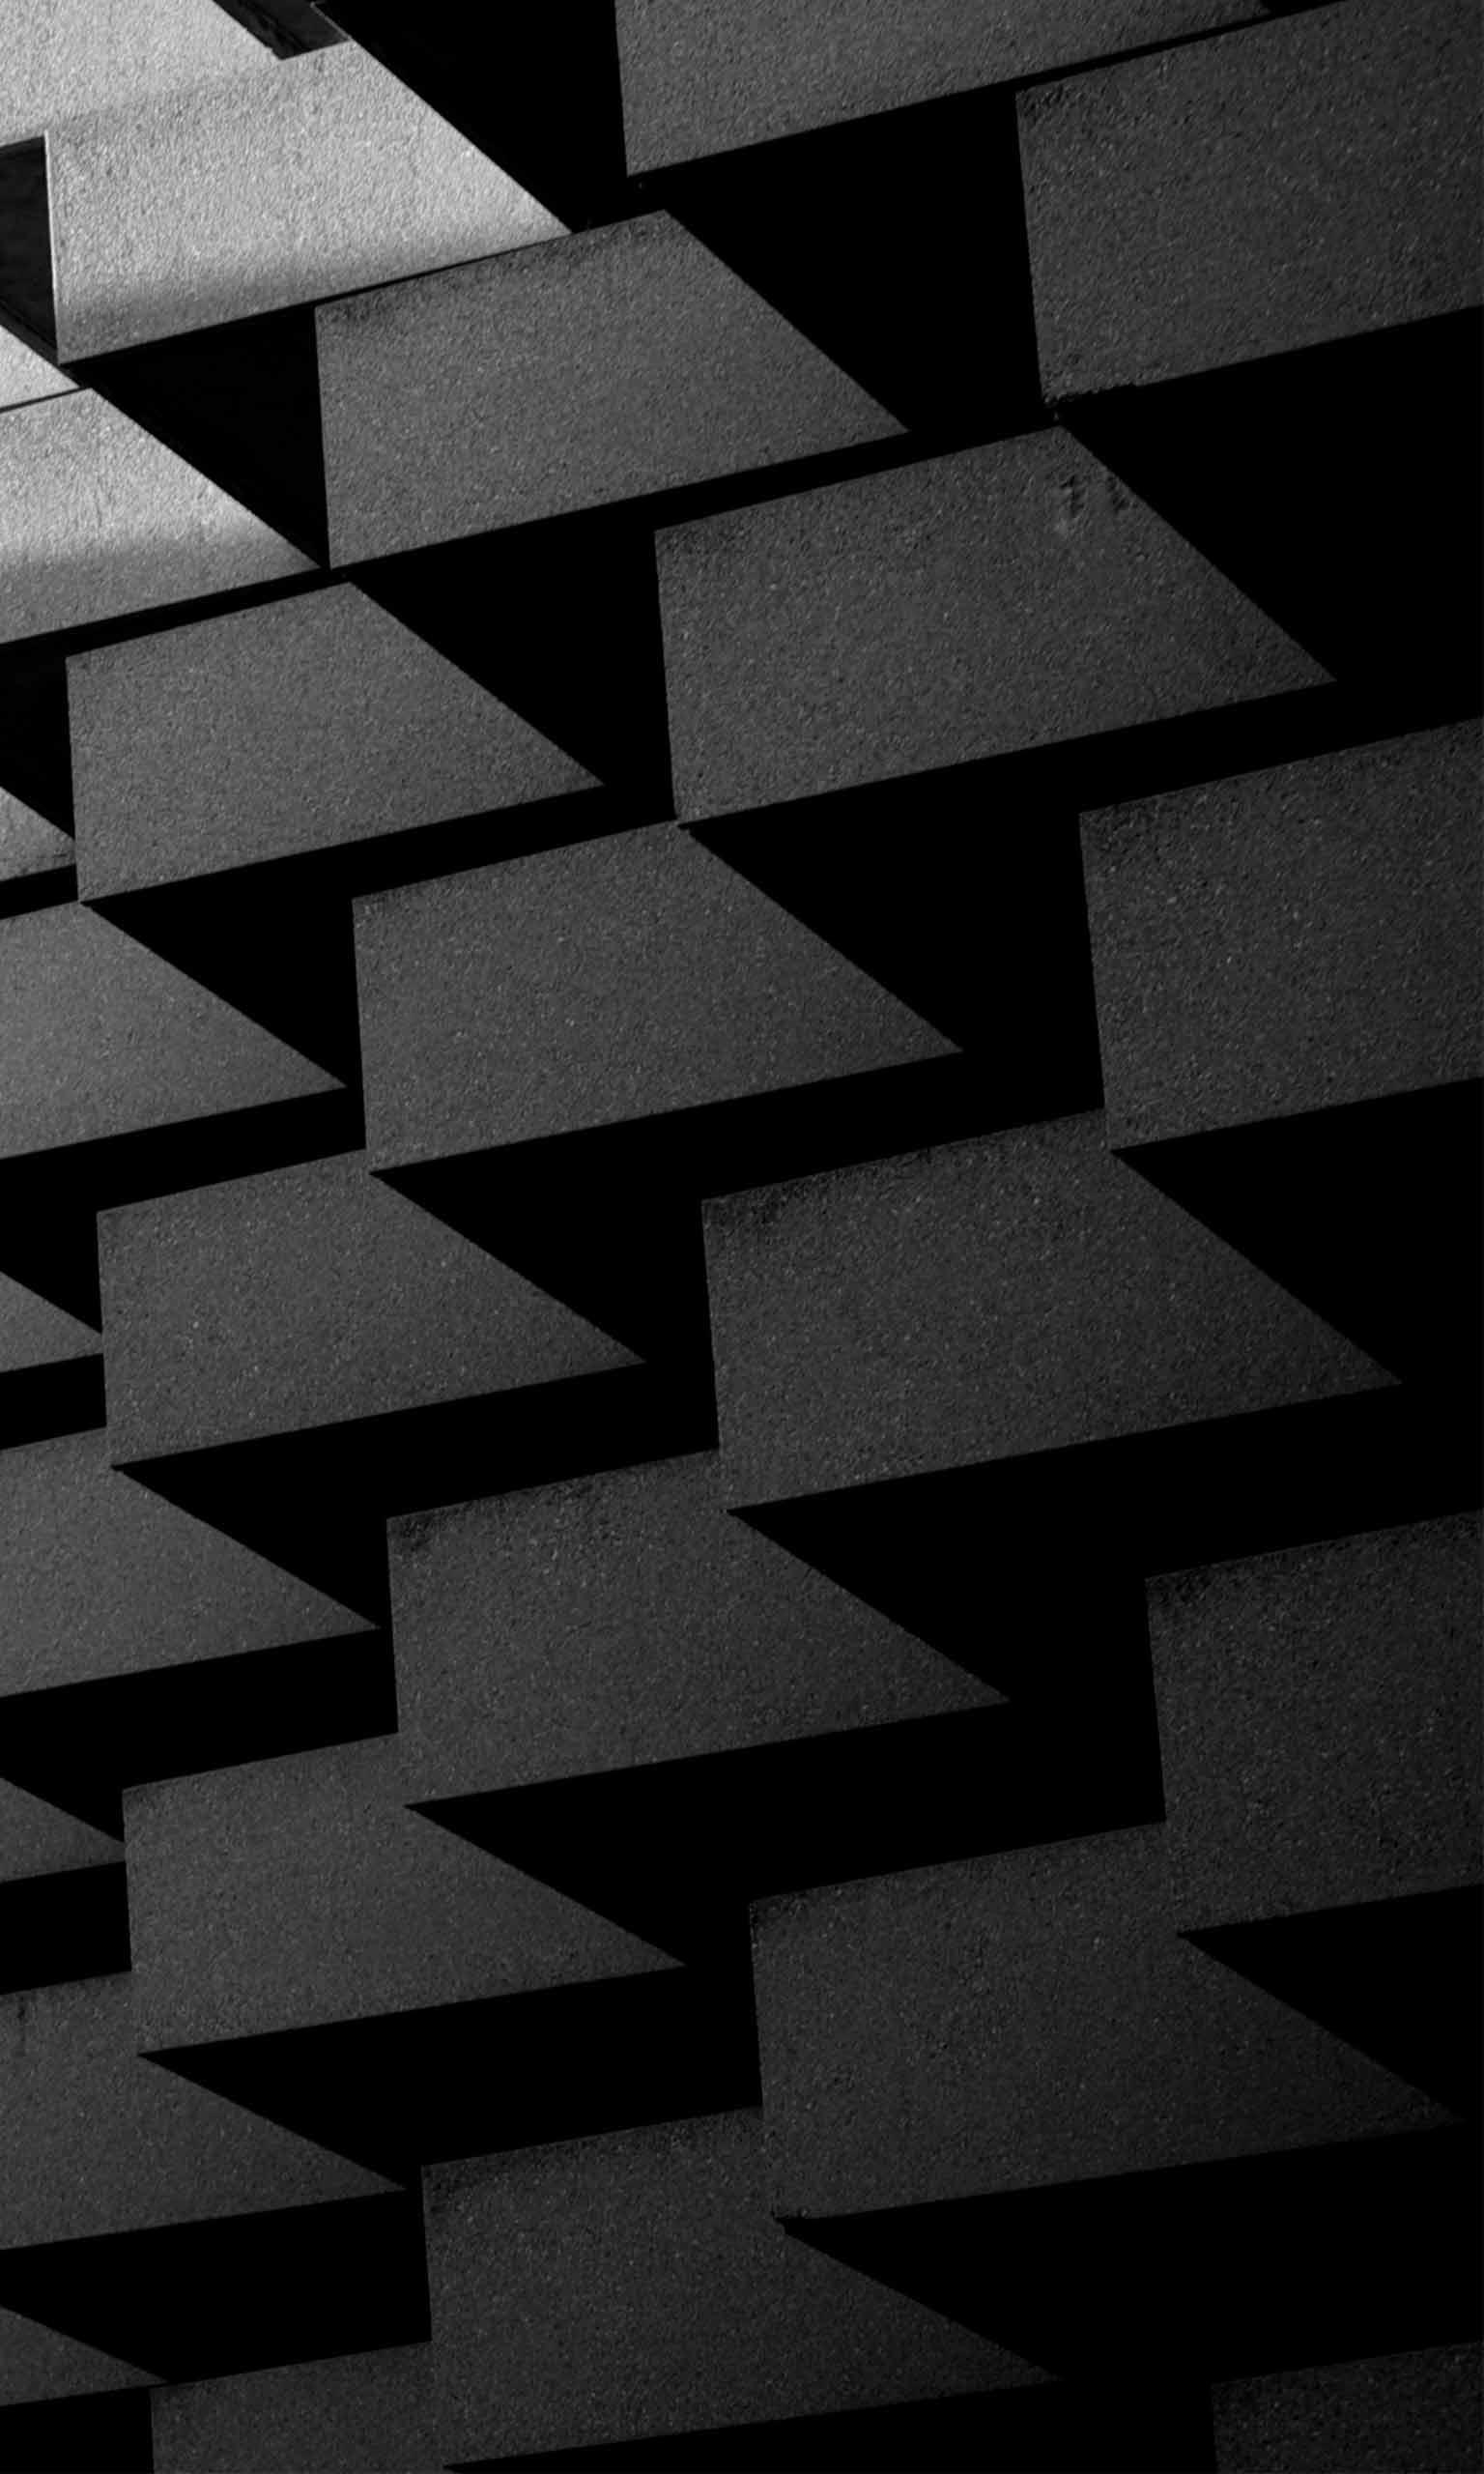 More Wallpaper Collections K Black Wallpaper Hd For Mobile 1536x2560 Download Hd Wallpaper Wallpapertip